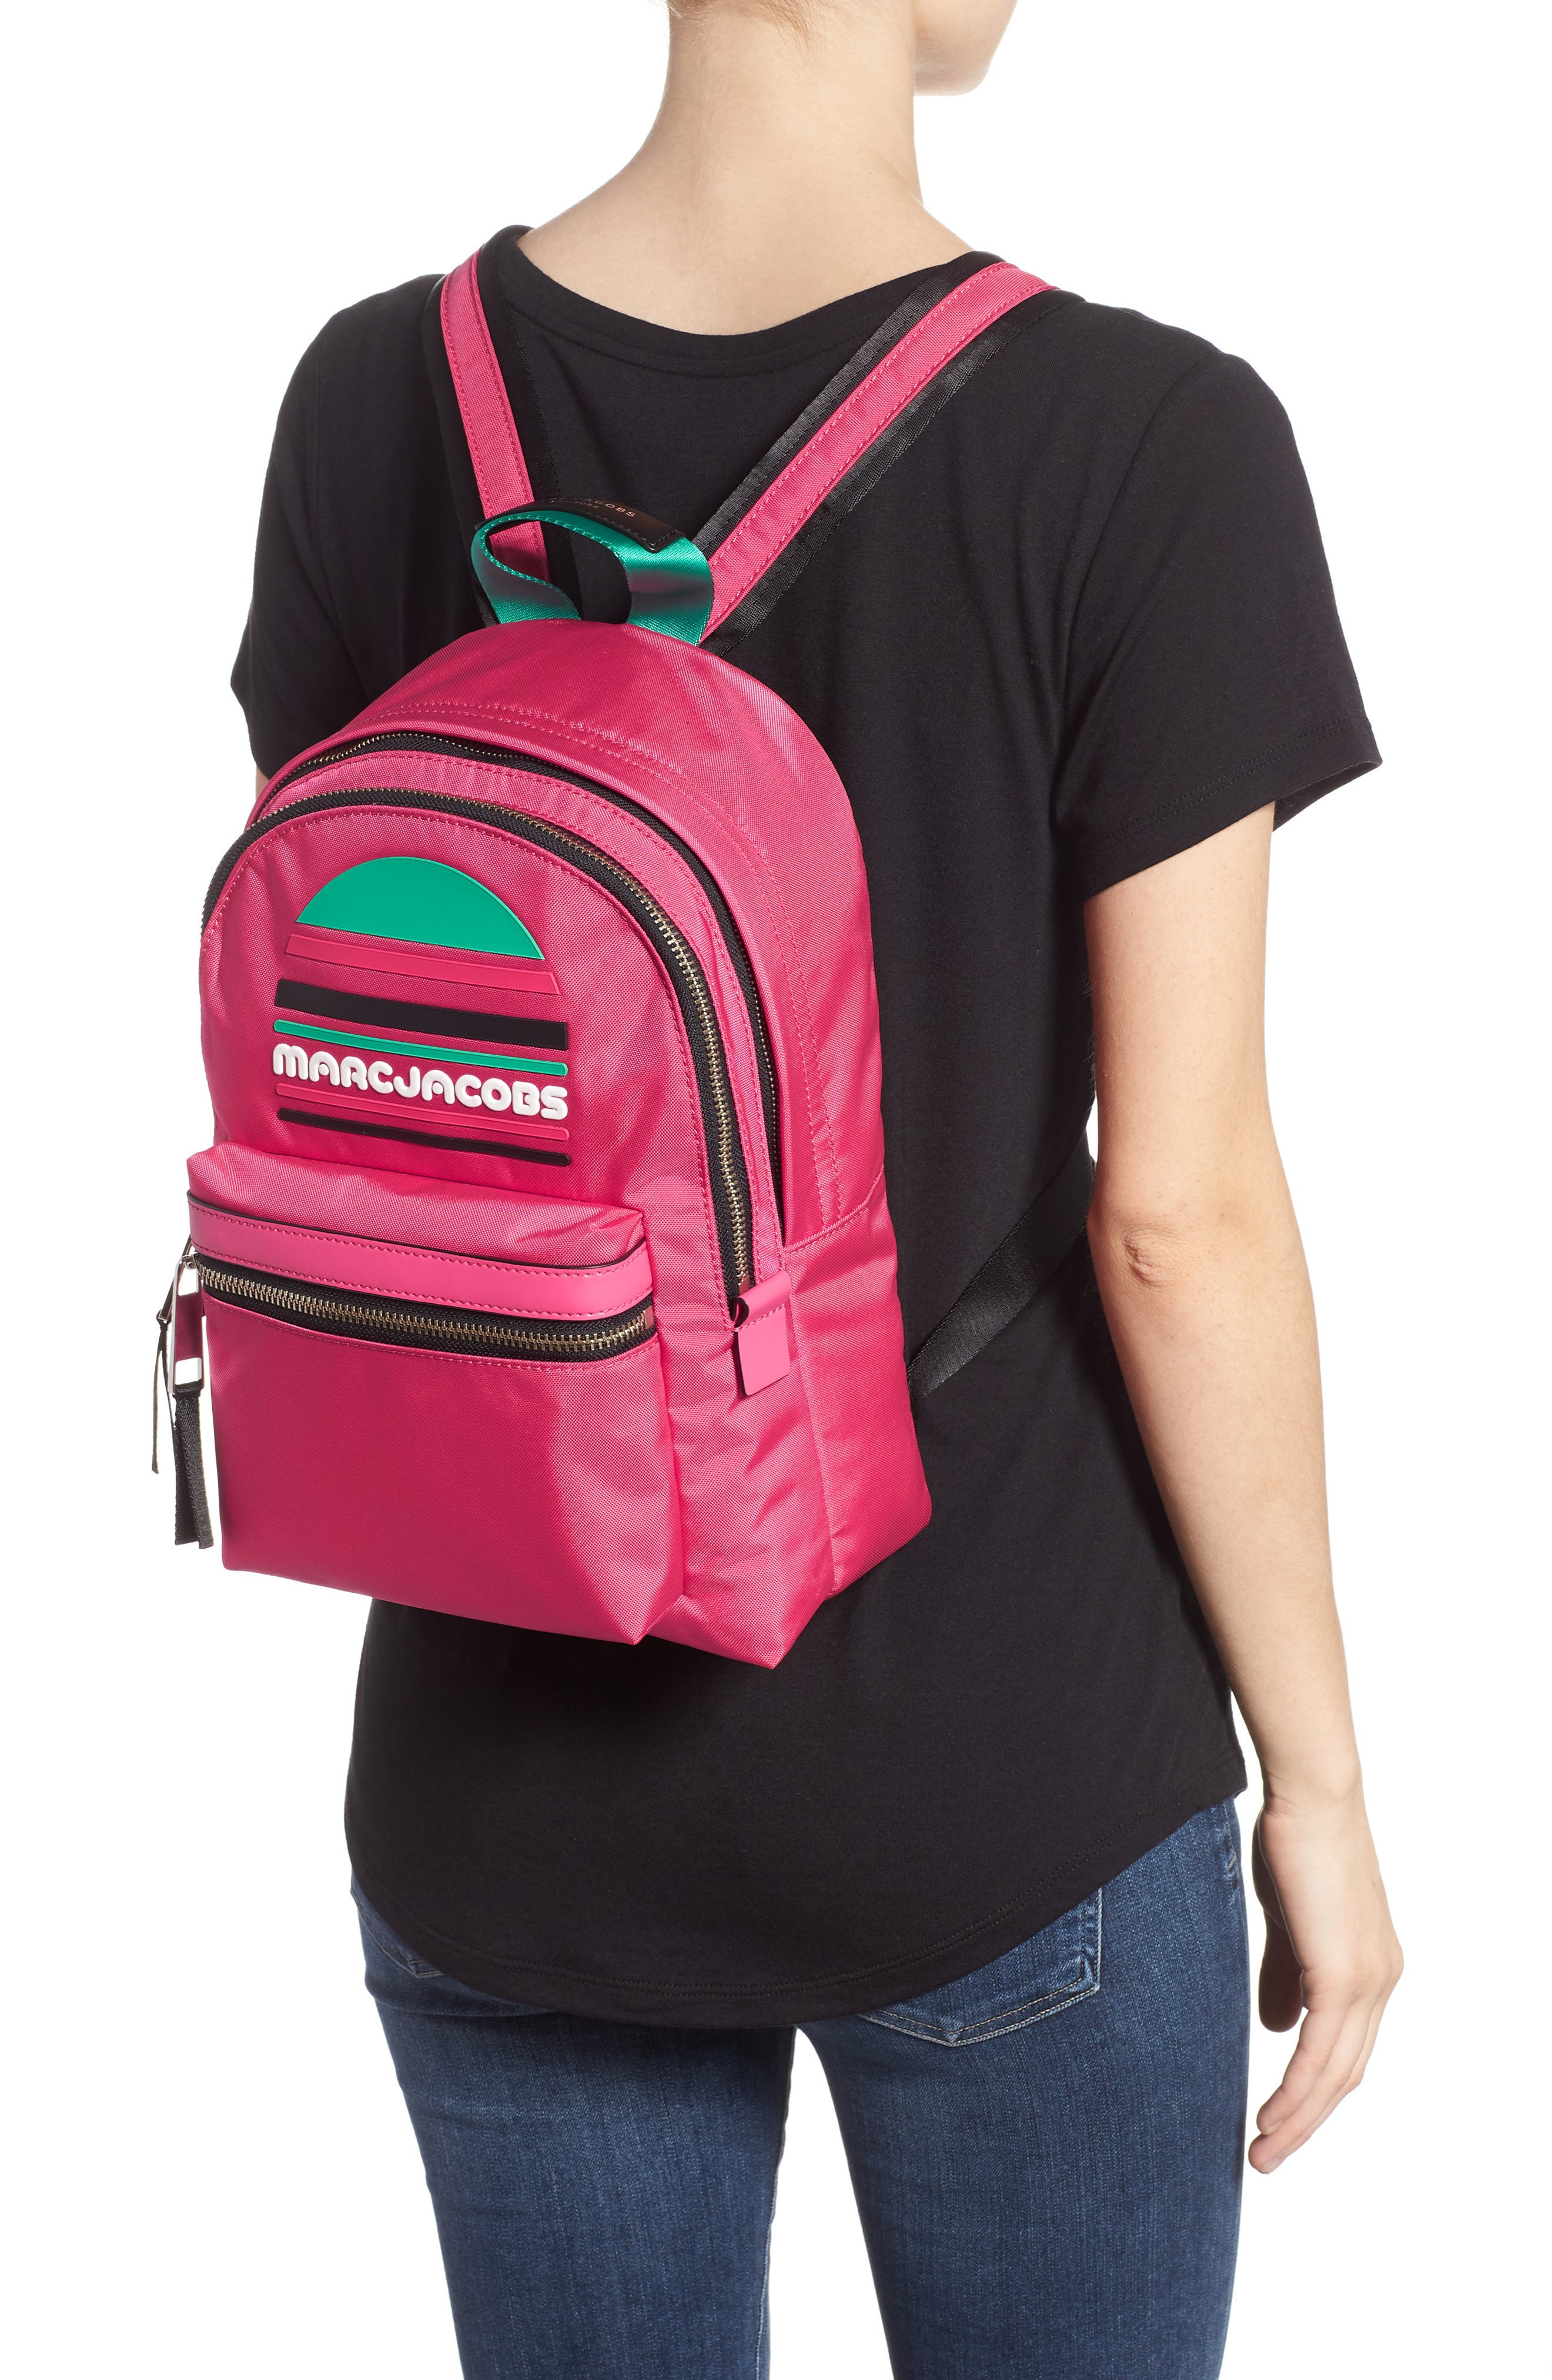 Medium Sport Trek Backpack,                             Alternate thumbnail 2, color,                             PEONY